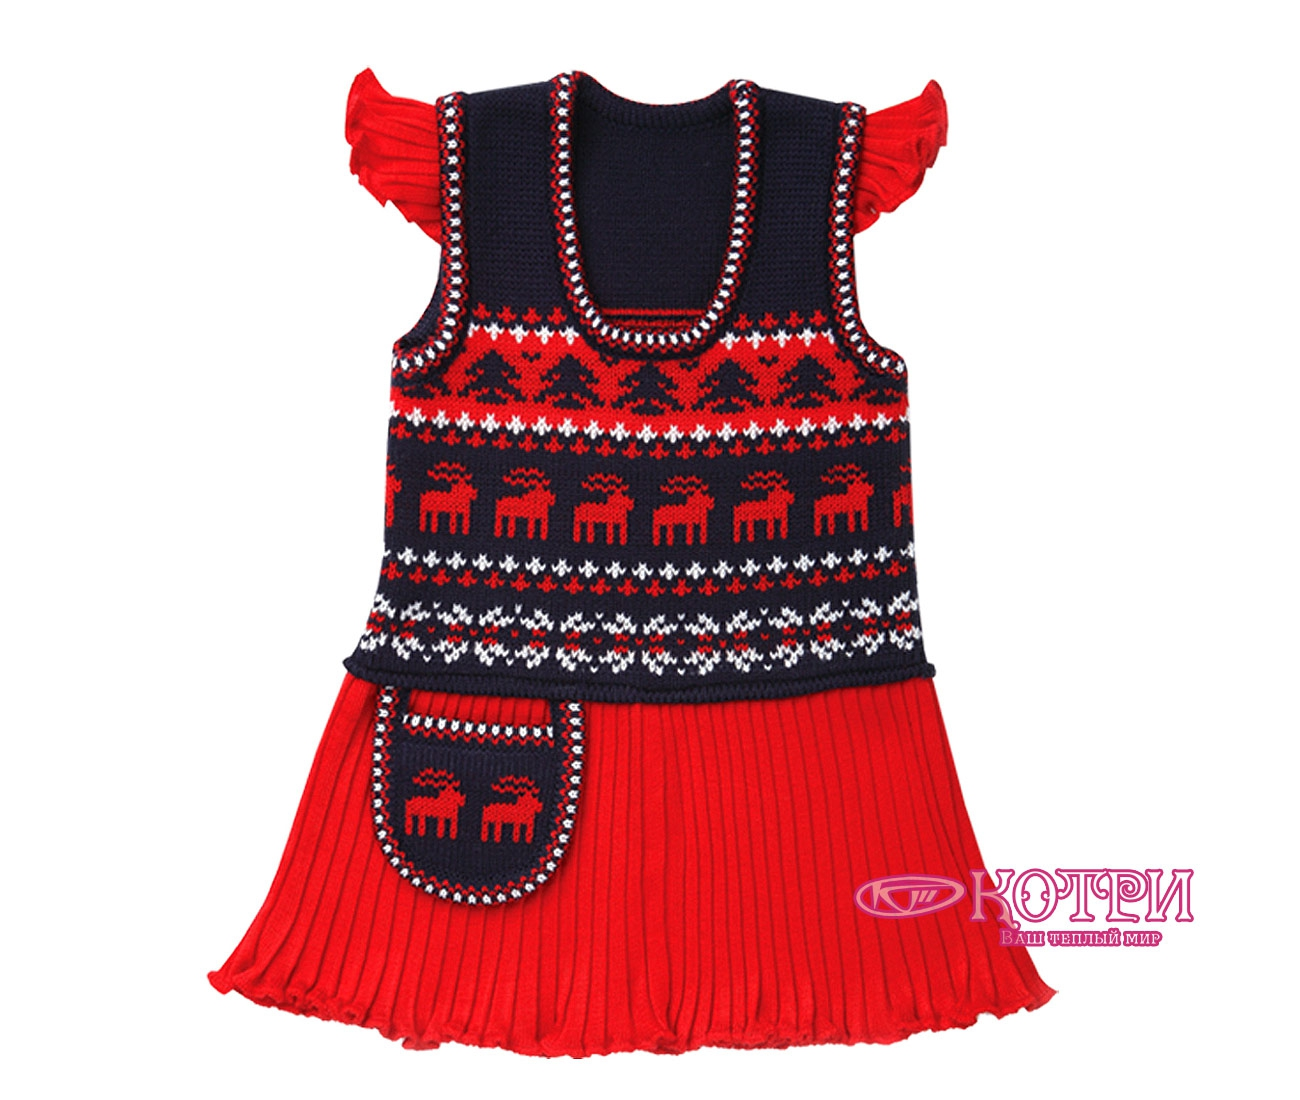 Платье-сарафан детский Зимние фантазии артикул 112-1 в Коврове на PromPortal.su (ID# 1243159